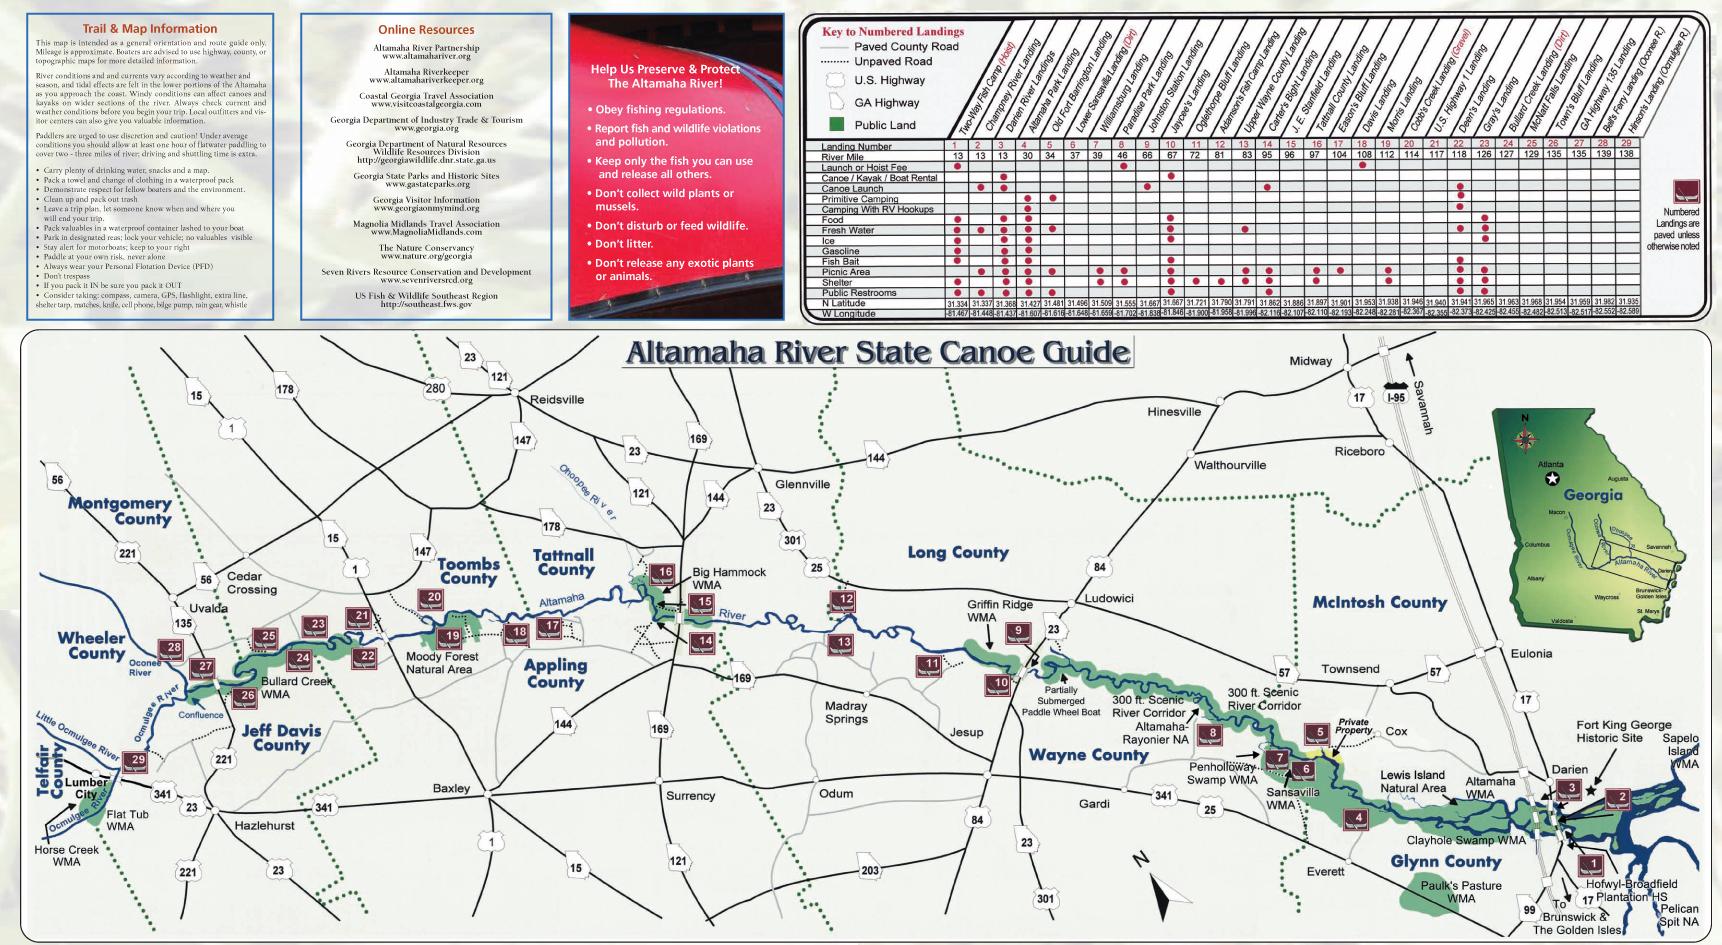 Altamaha River Canoe Trail